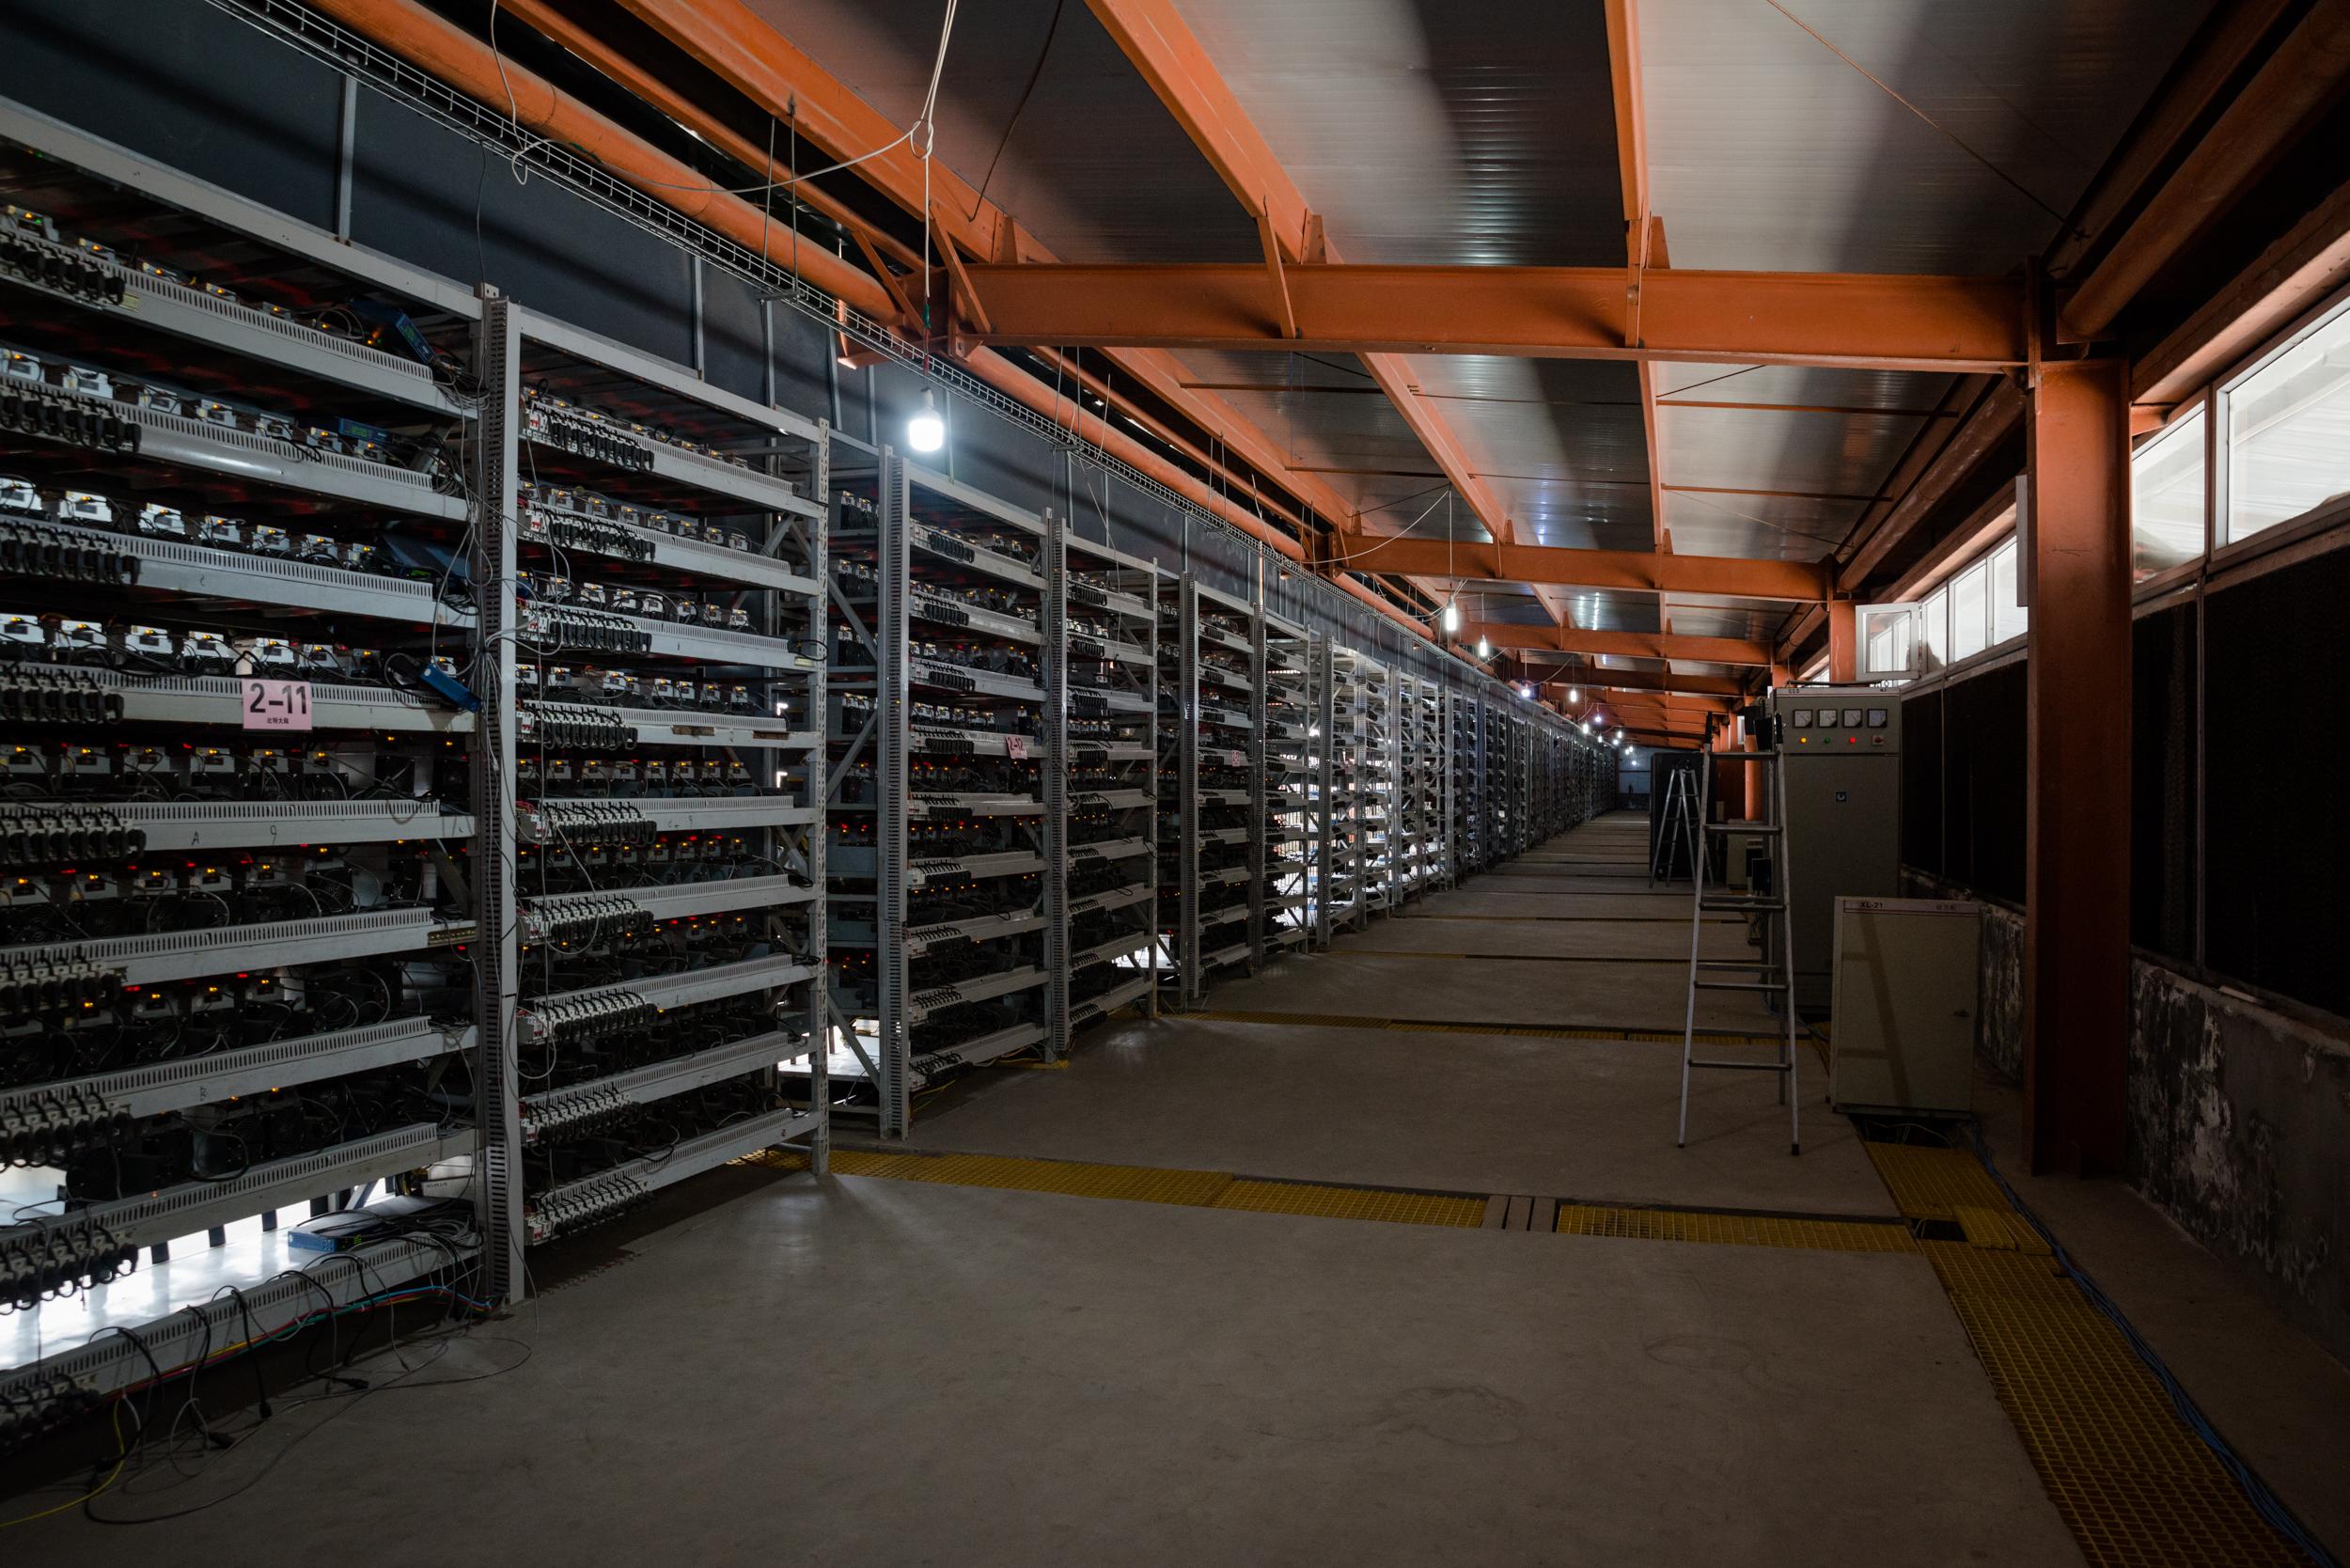 Minmetals luzhong mining bitcoins william hill betting phone number